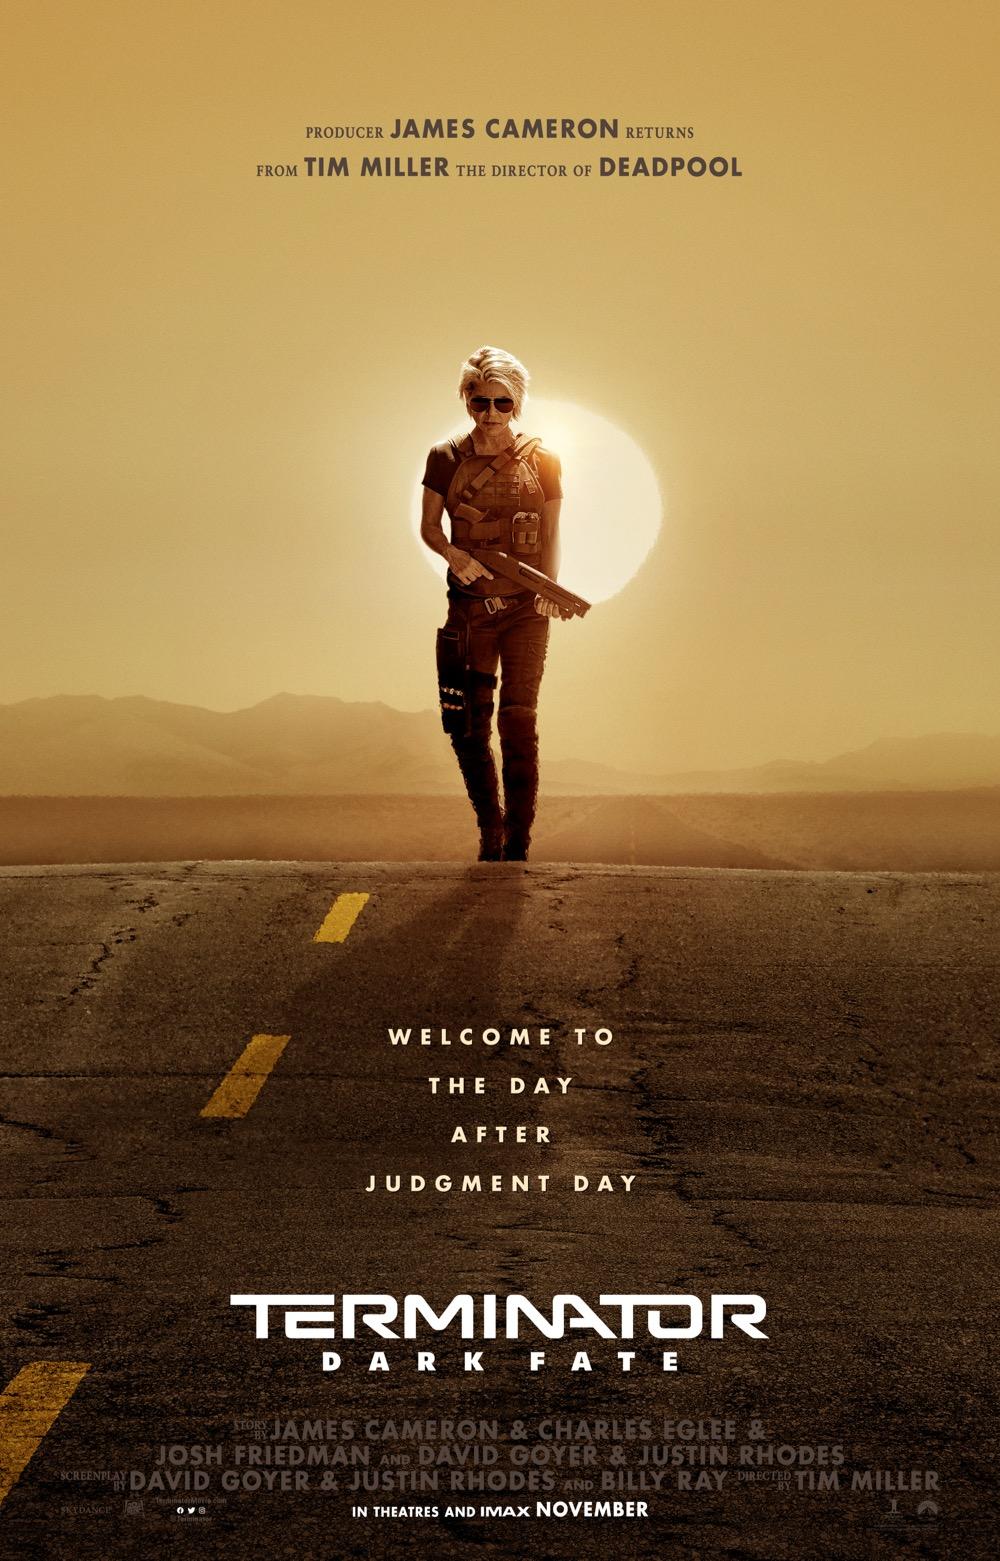 Sarah Connor returns in Terminator: Dark Fate Theatrical Poster (Paramount Pictures)